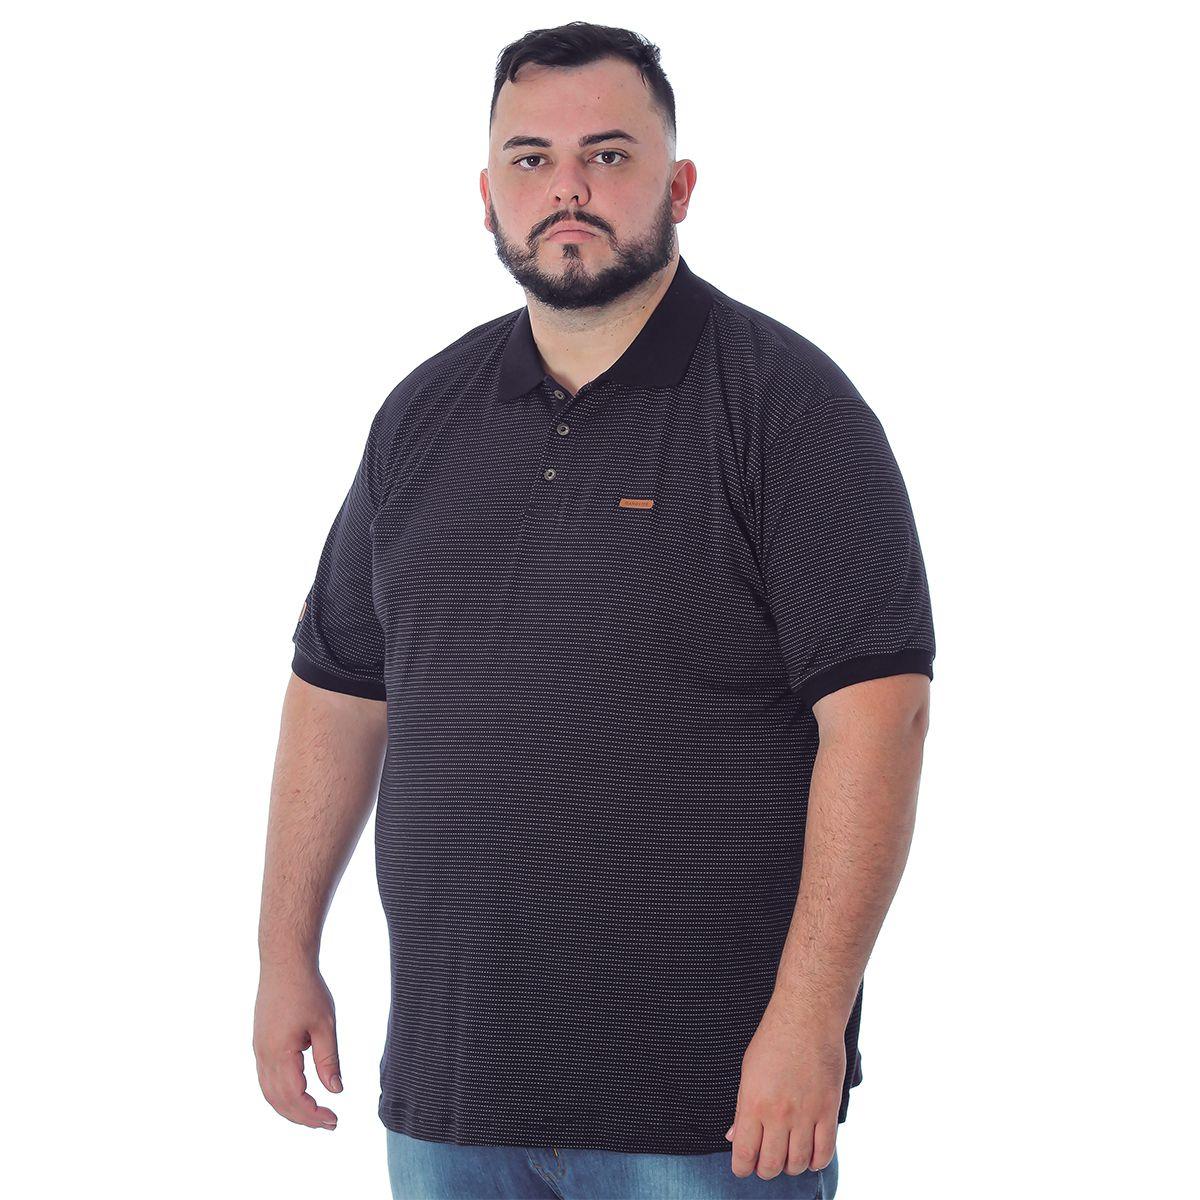 Camiseta Polo Masculina Gangster 64.56.0044